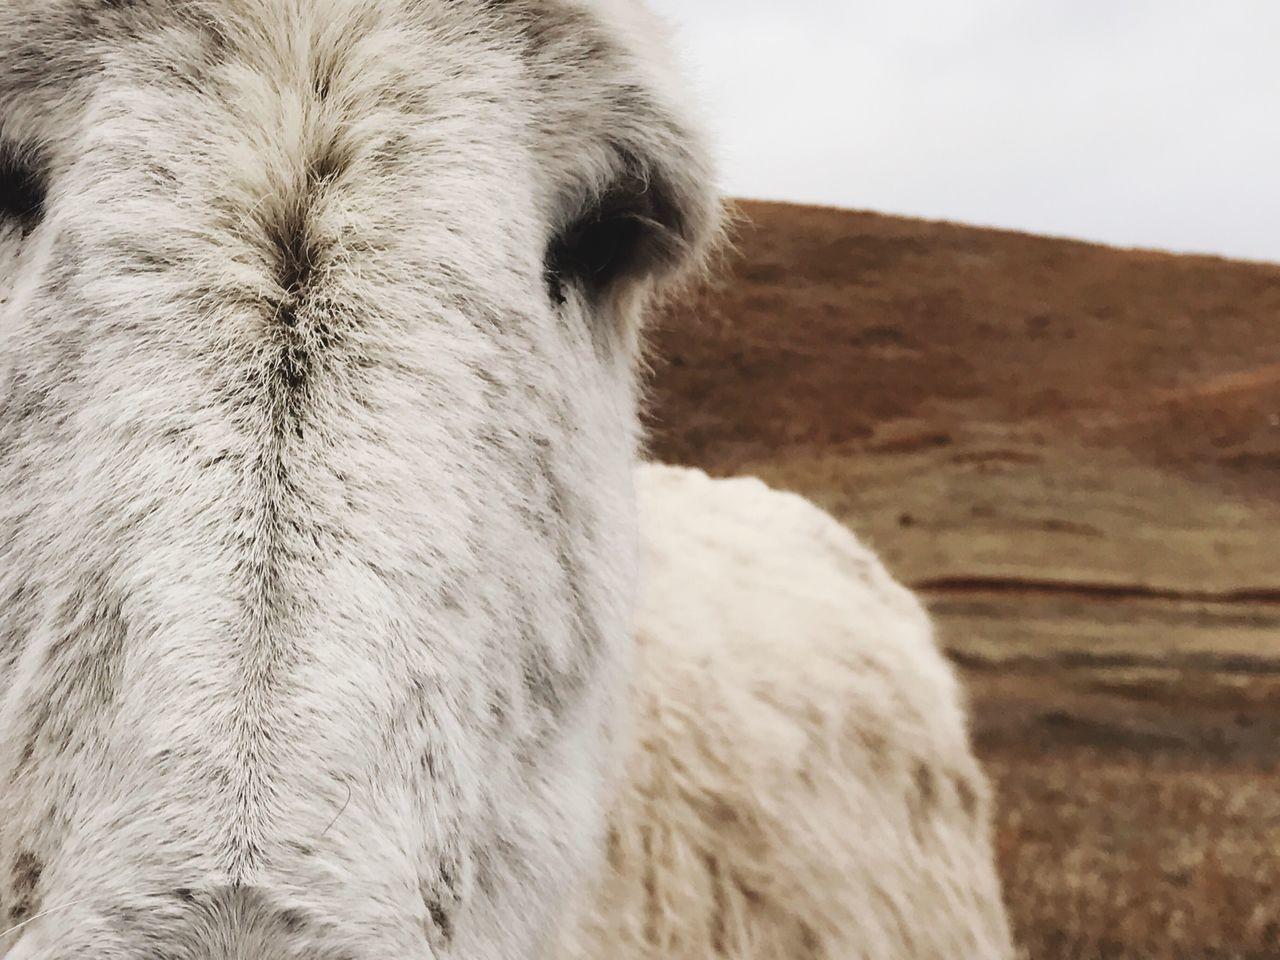 Animal Themes The Great Outdoors - 2017 EyeEm Awards The Portraitist - 2017 EyeEm Awards